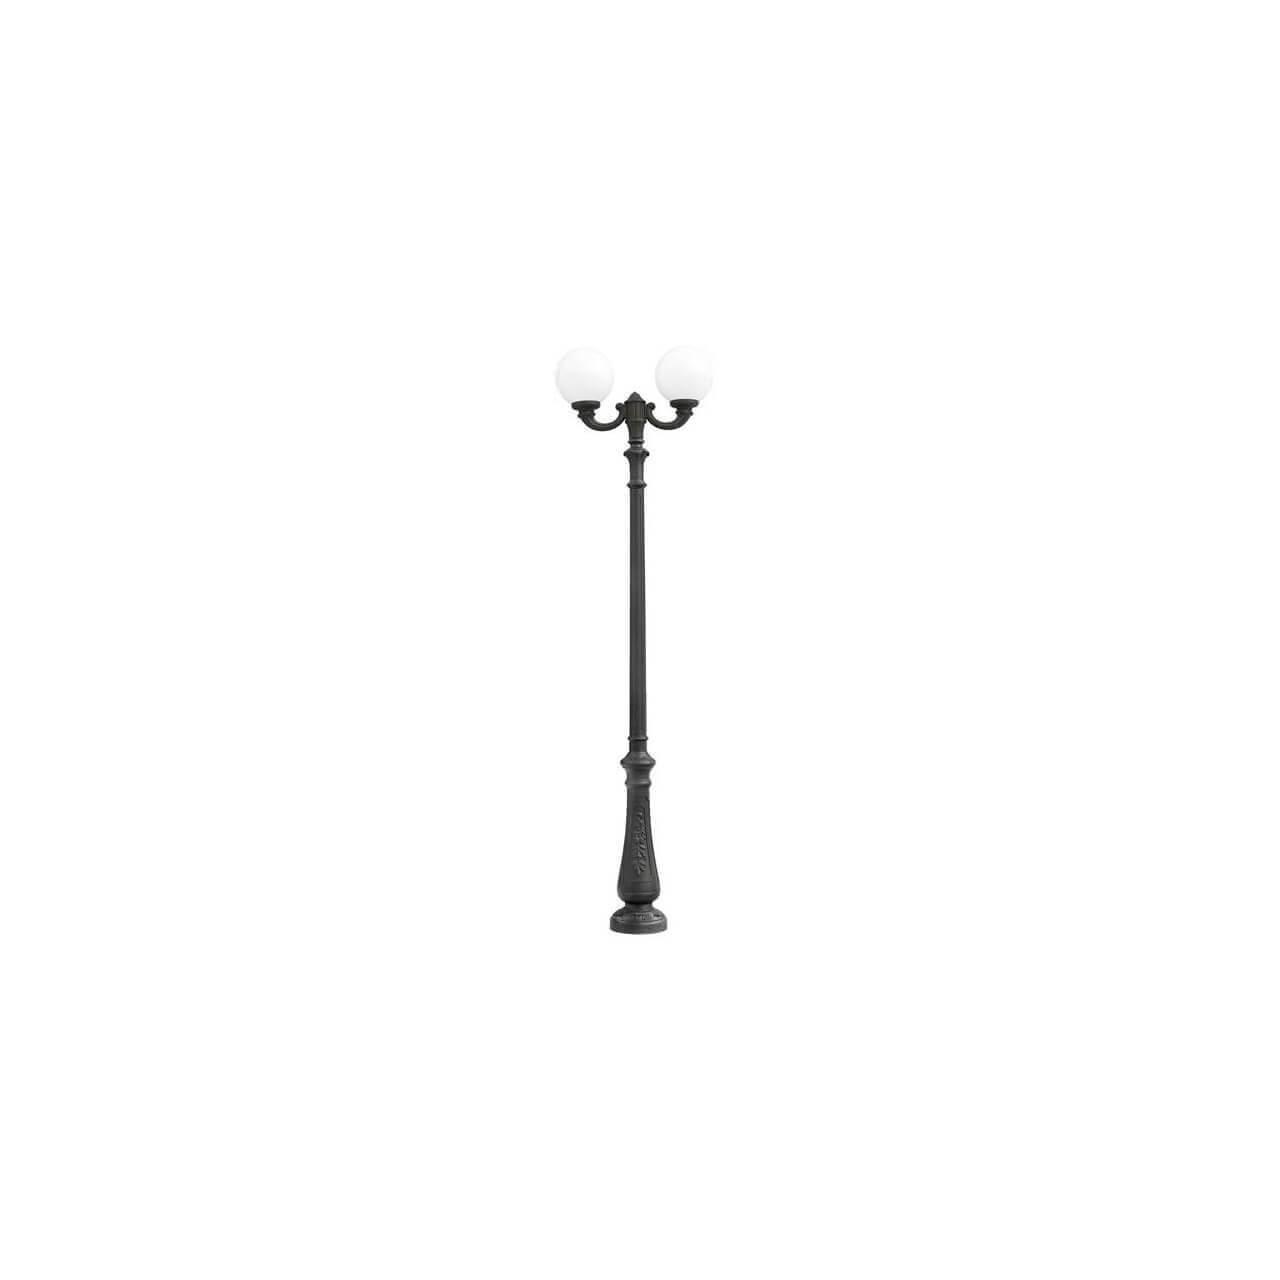 Светильник Fumagalli G30.202.R20.AYE27 Nebo Ofir/G300 цена 2017